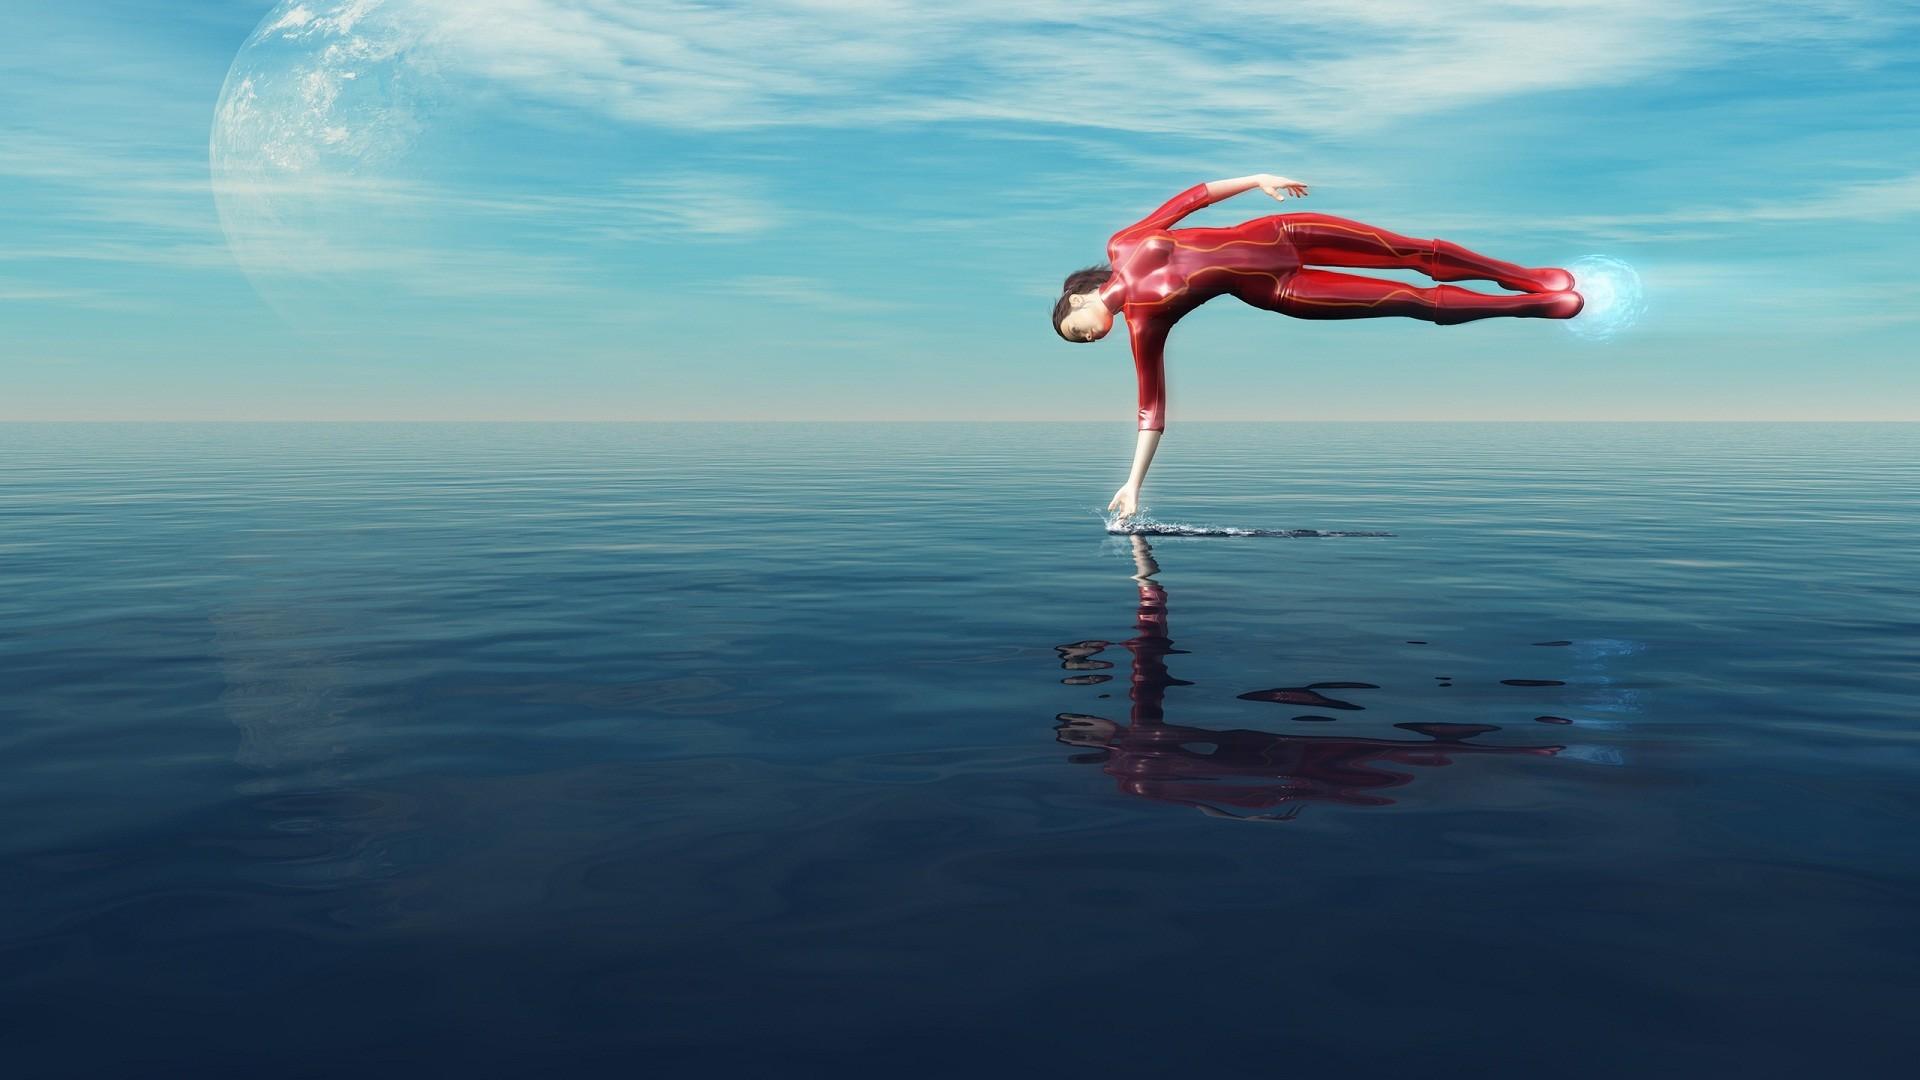 Magic girl power on water 3D wallpaper download